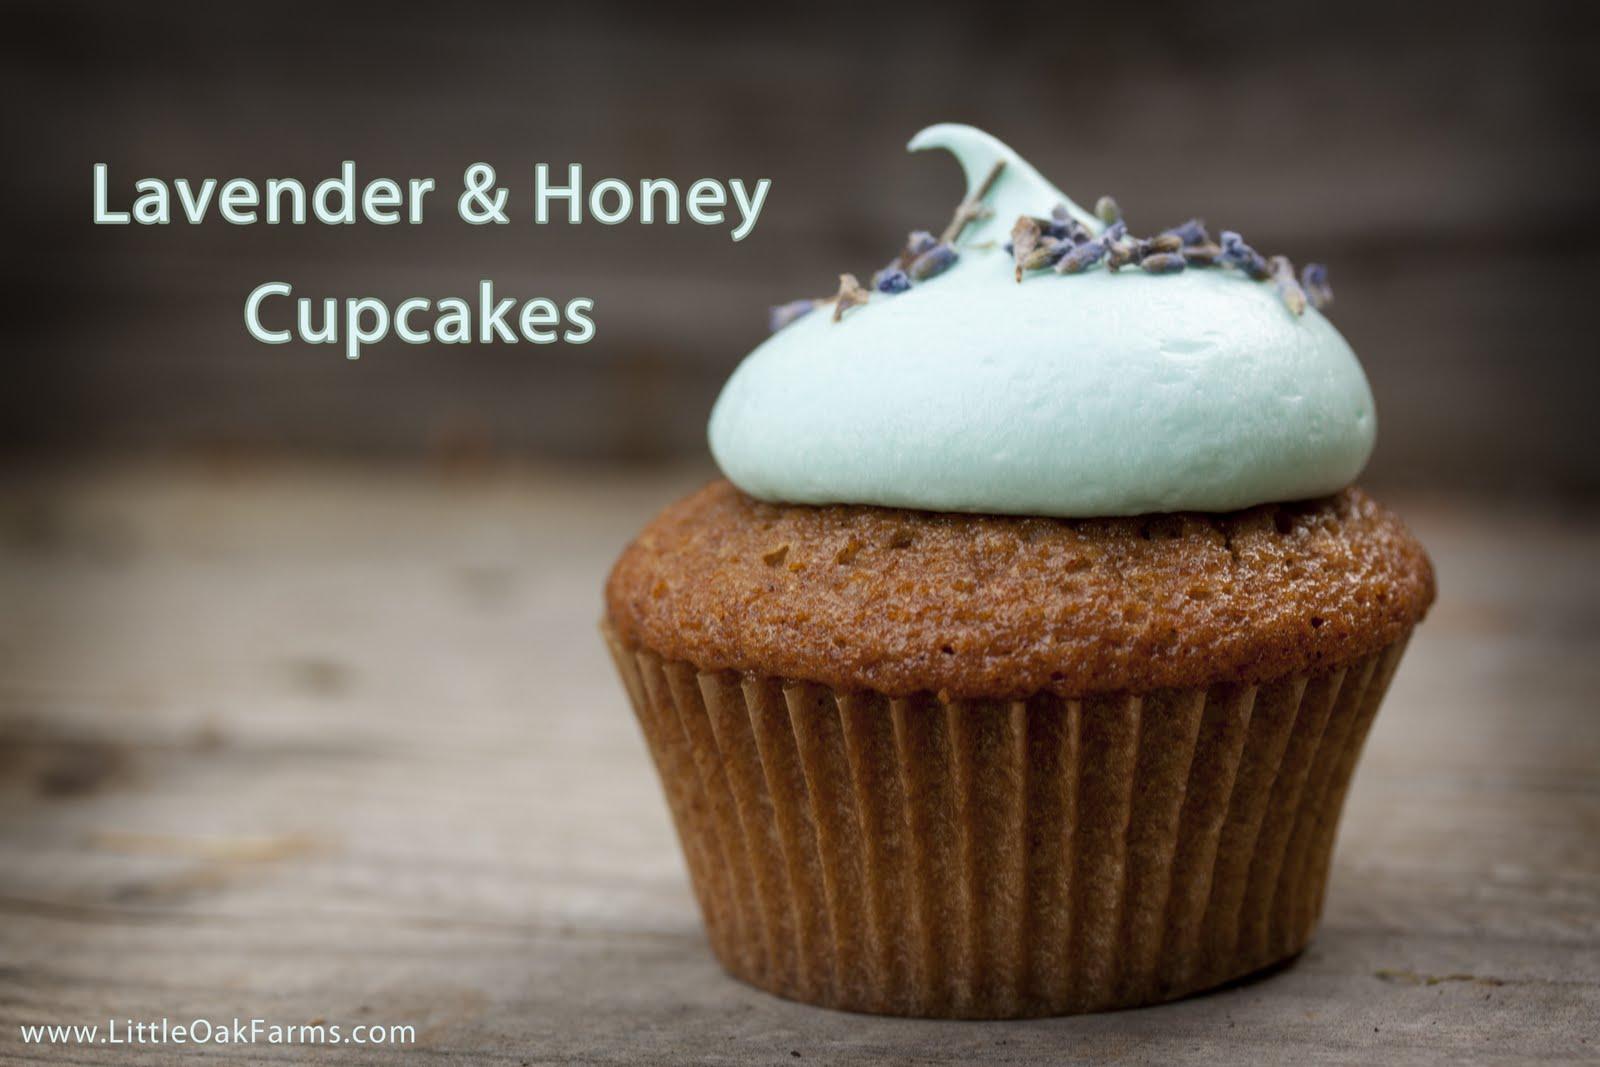 Little Oak Farms Kitchen: Herbs | Lavender & Honey Cupcakes